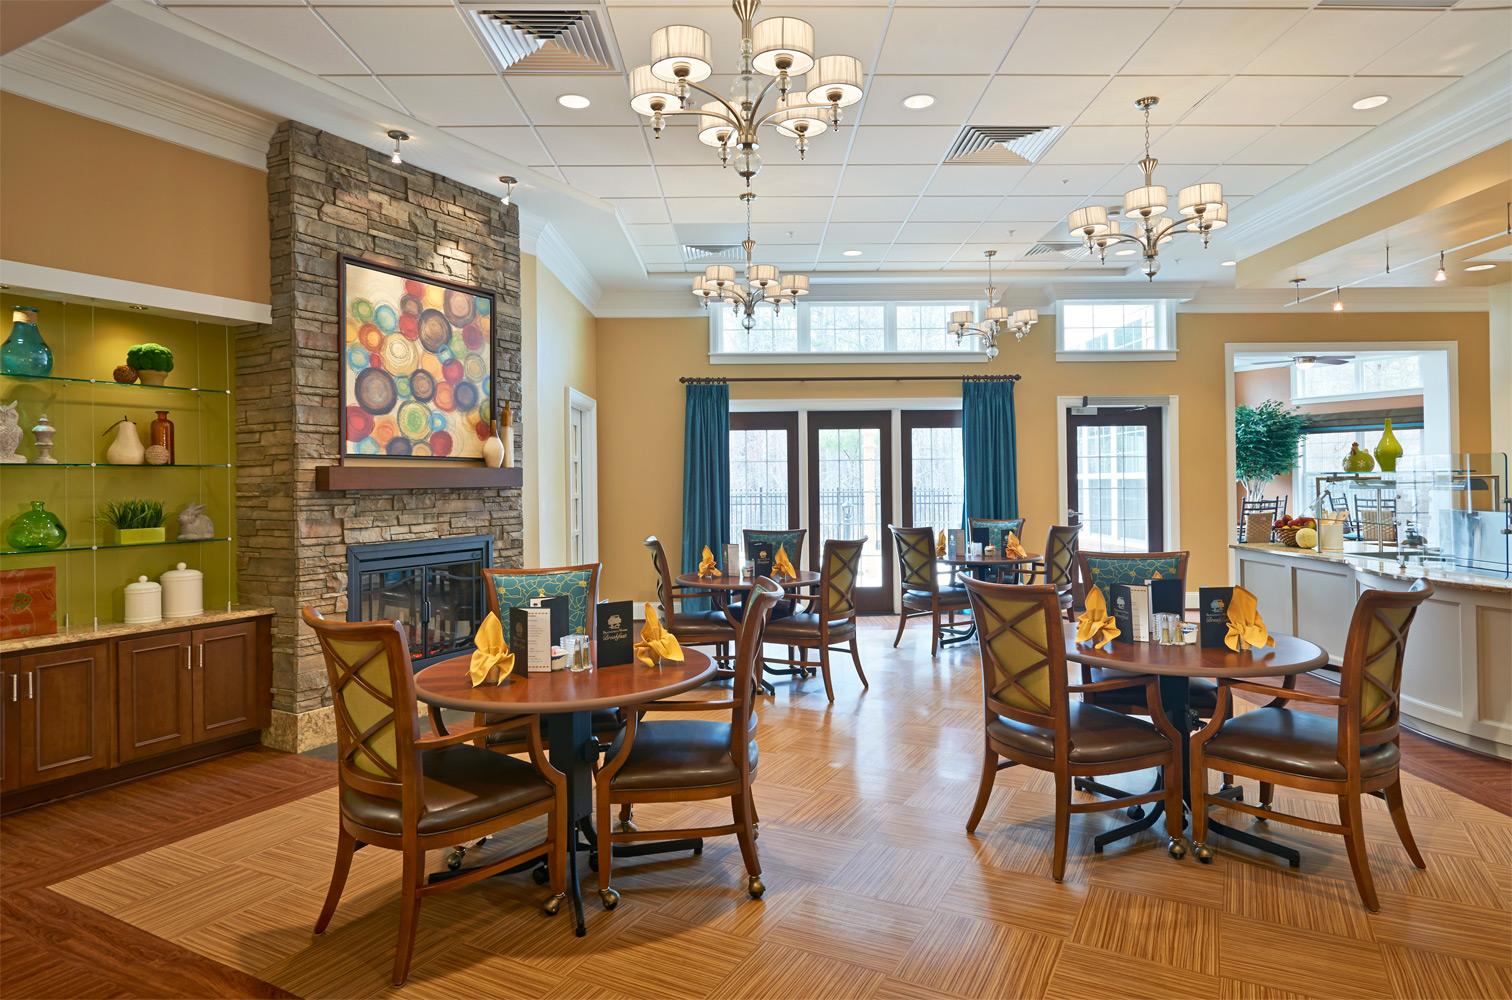 Brandermill Woods Skilled Care Dining Room Image